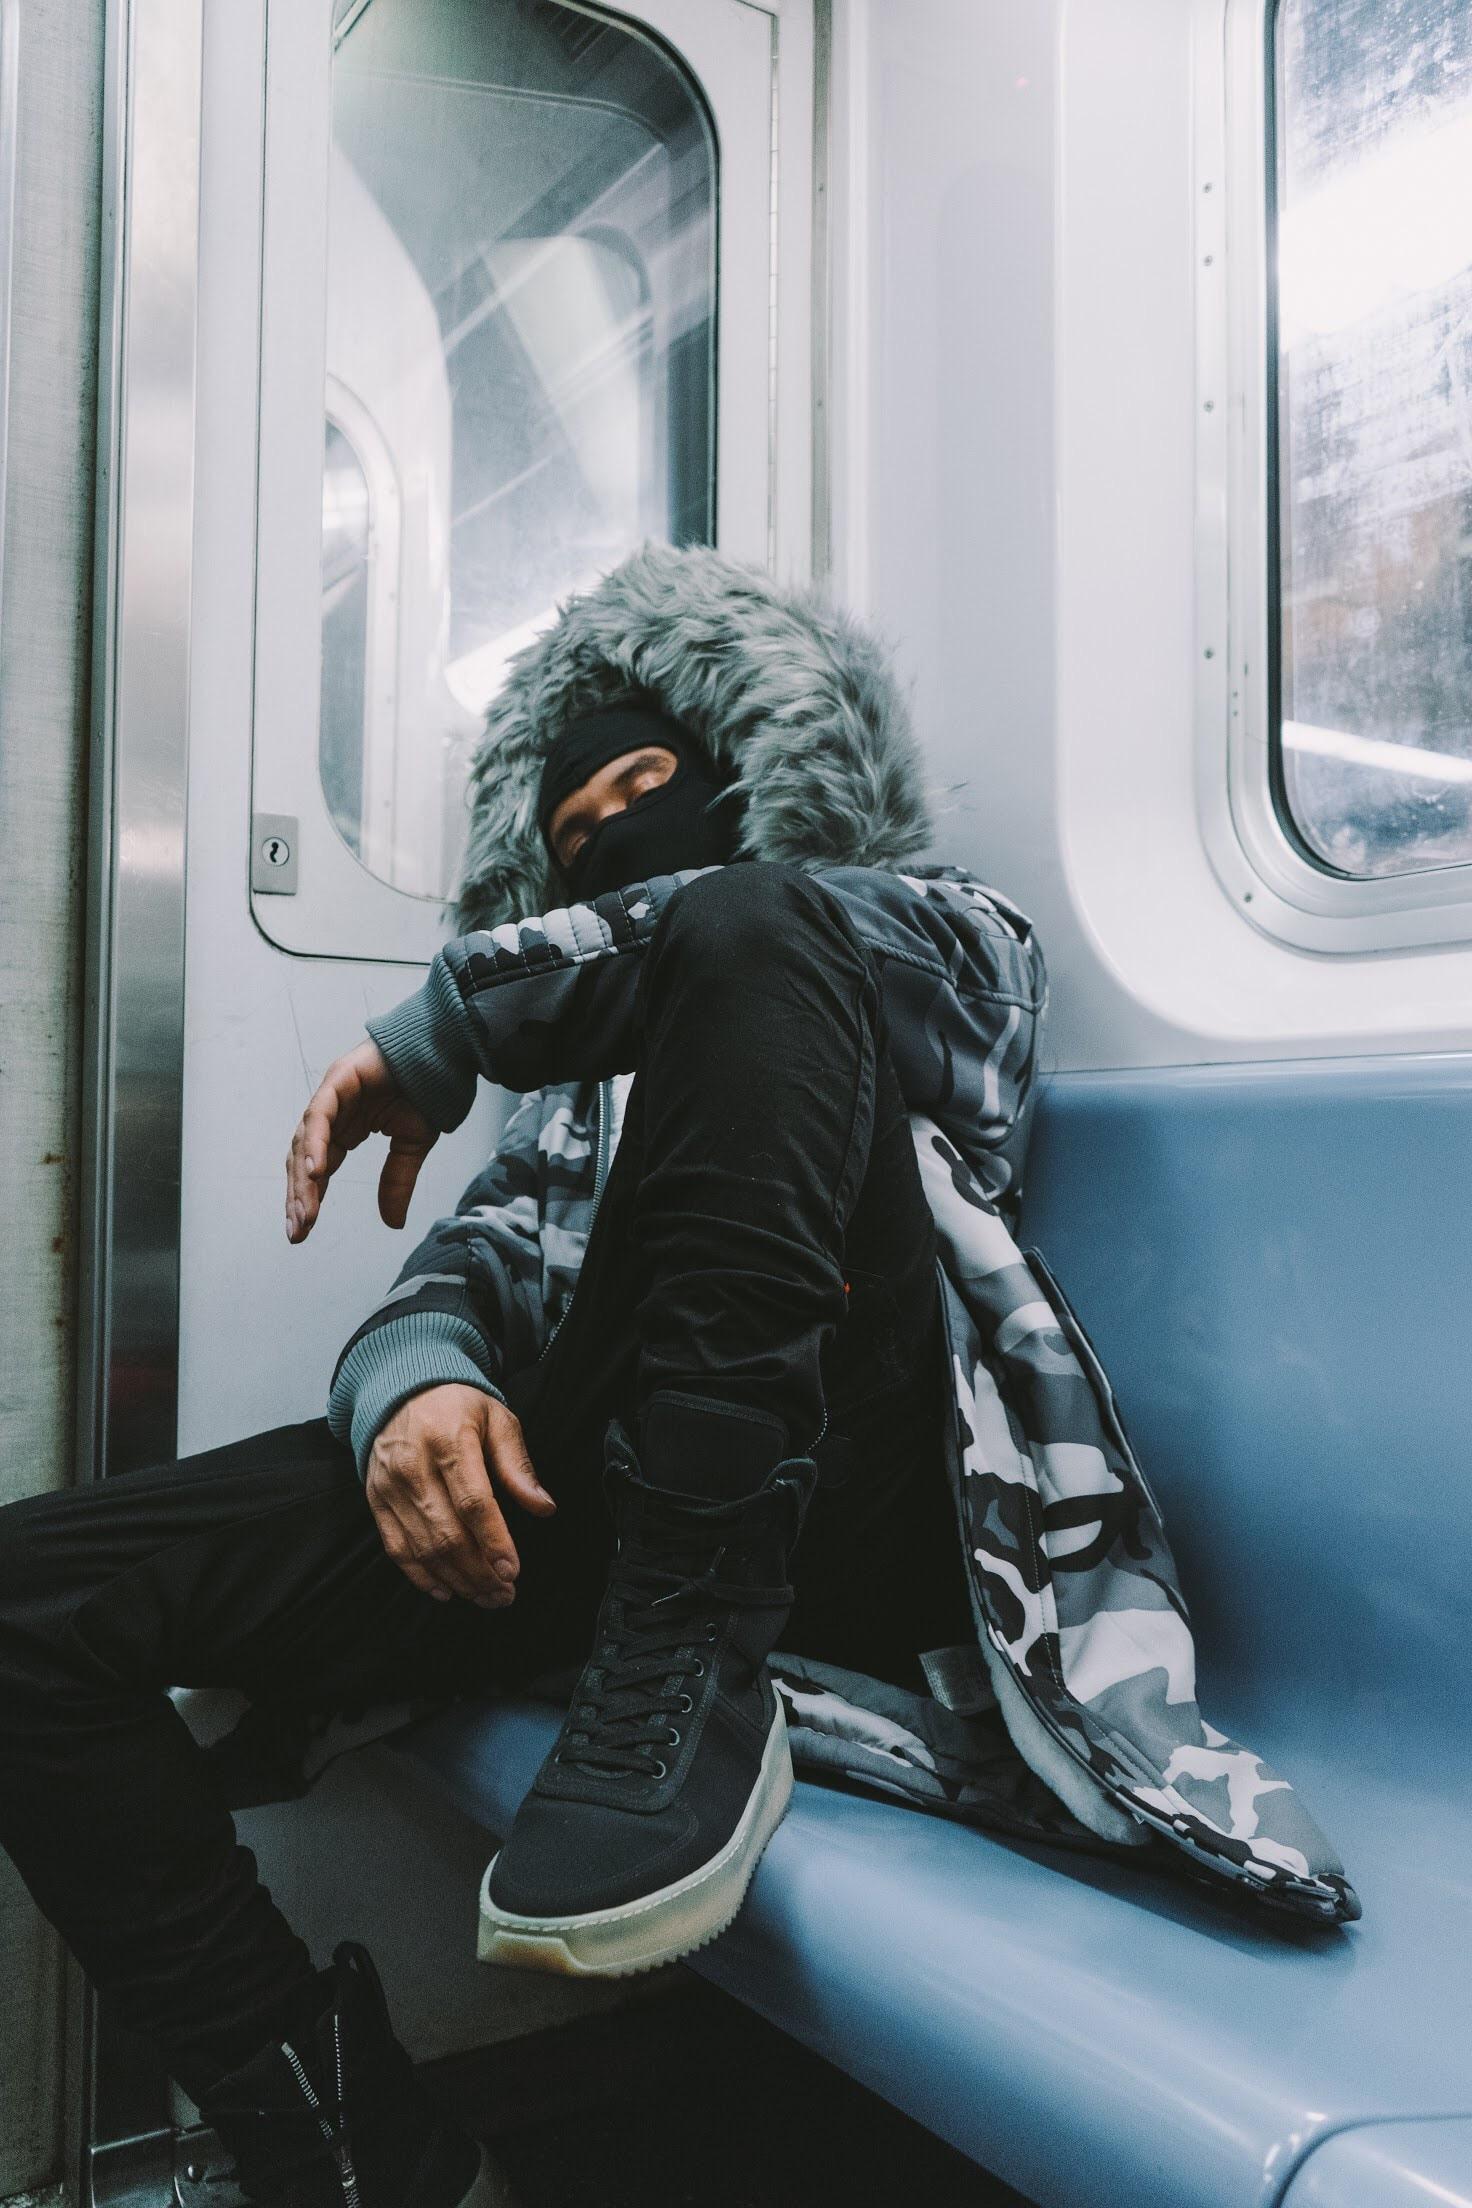 man sitting while leaning on the corner of passenger train wearing fur jacket